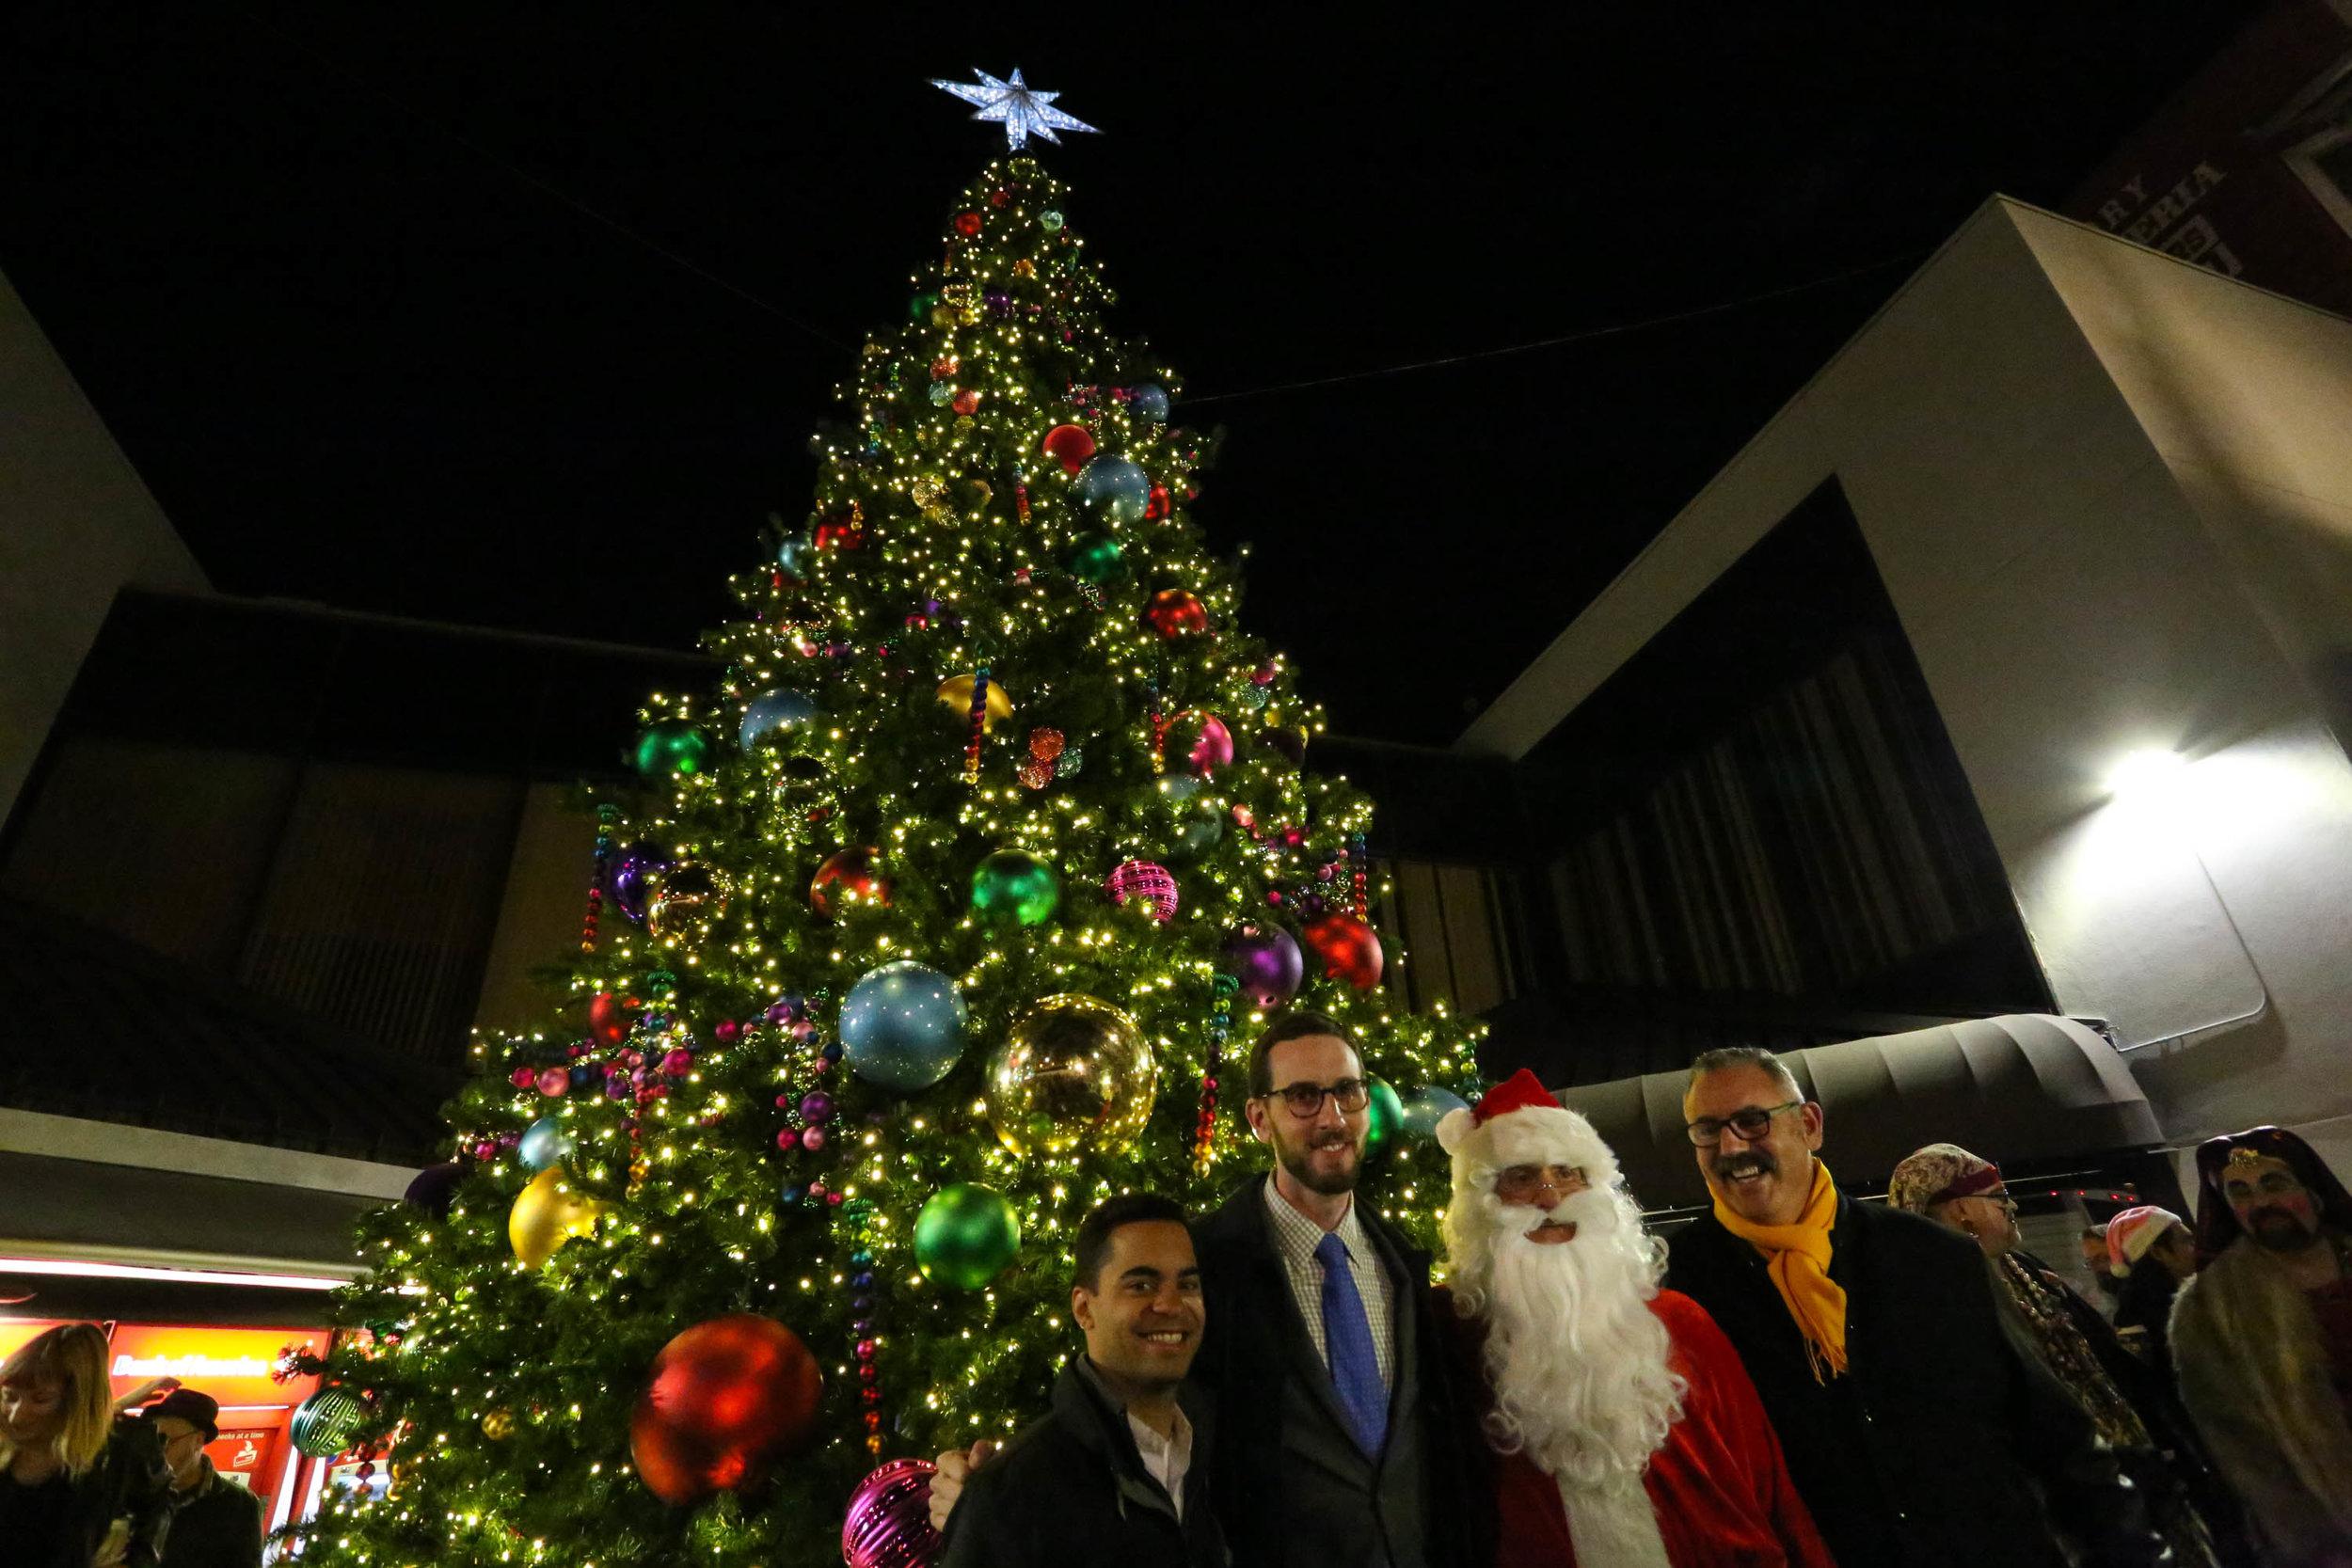 Scott Wiener, Santa and Daniel Bergerac at the Castro tree lighting on Monday, November 28, 2016. San Francisco, California (Jessica Webb)